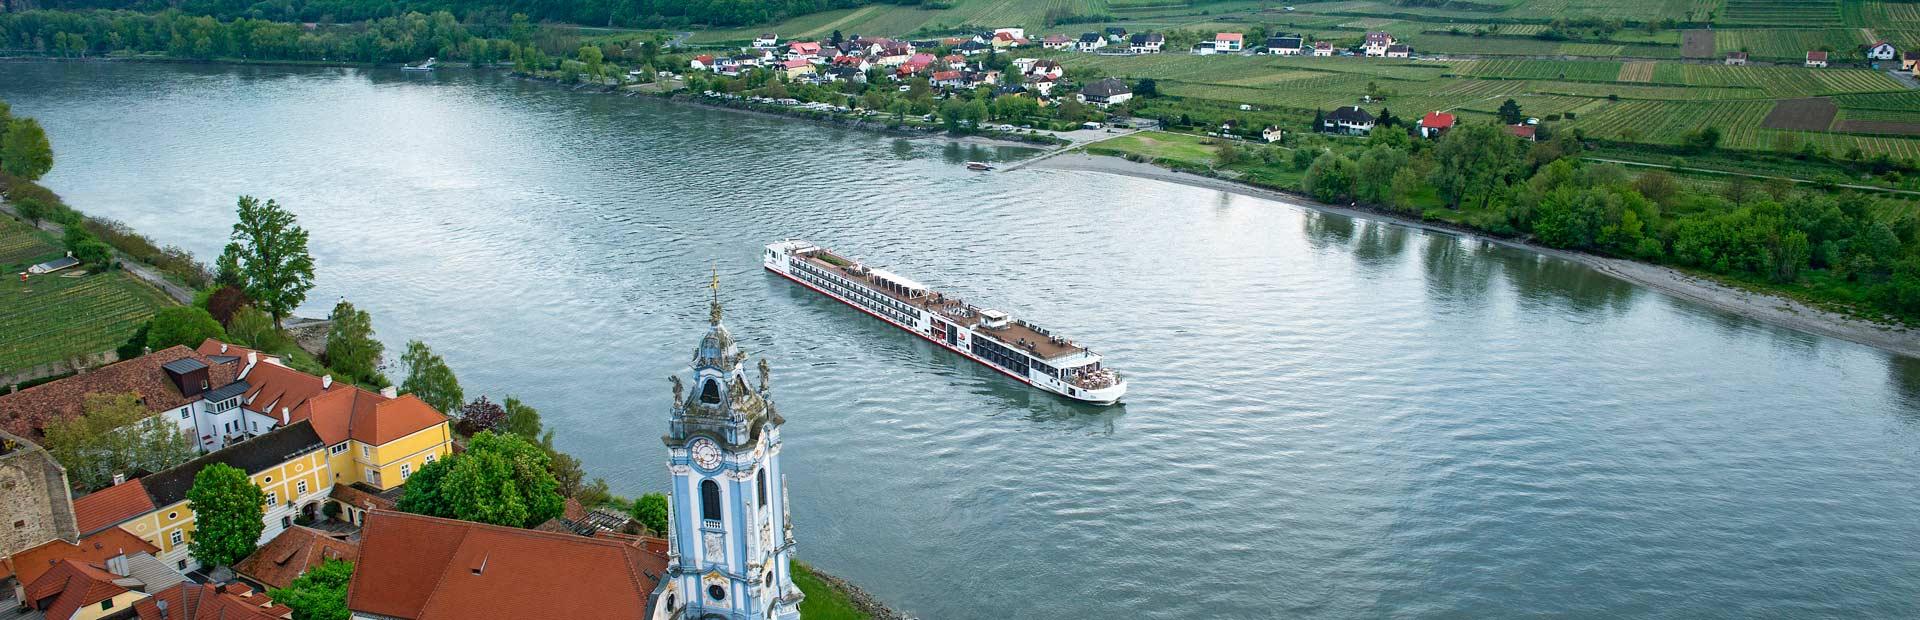 Viking Longship in Dürnstein